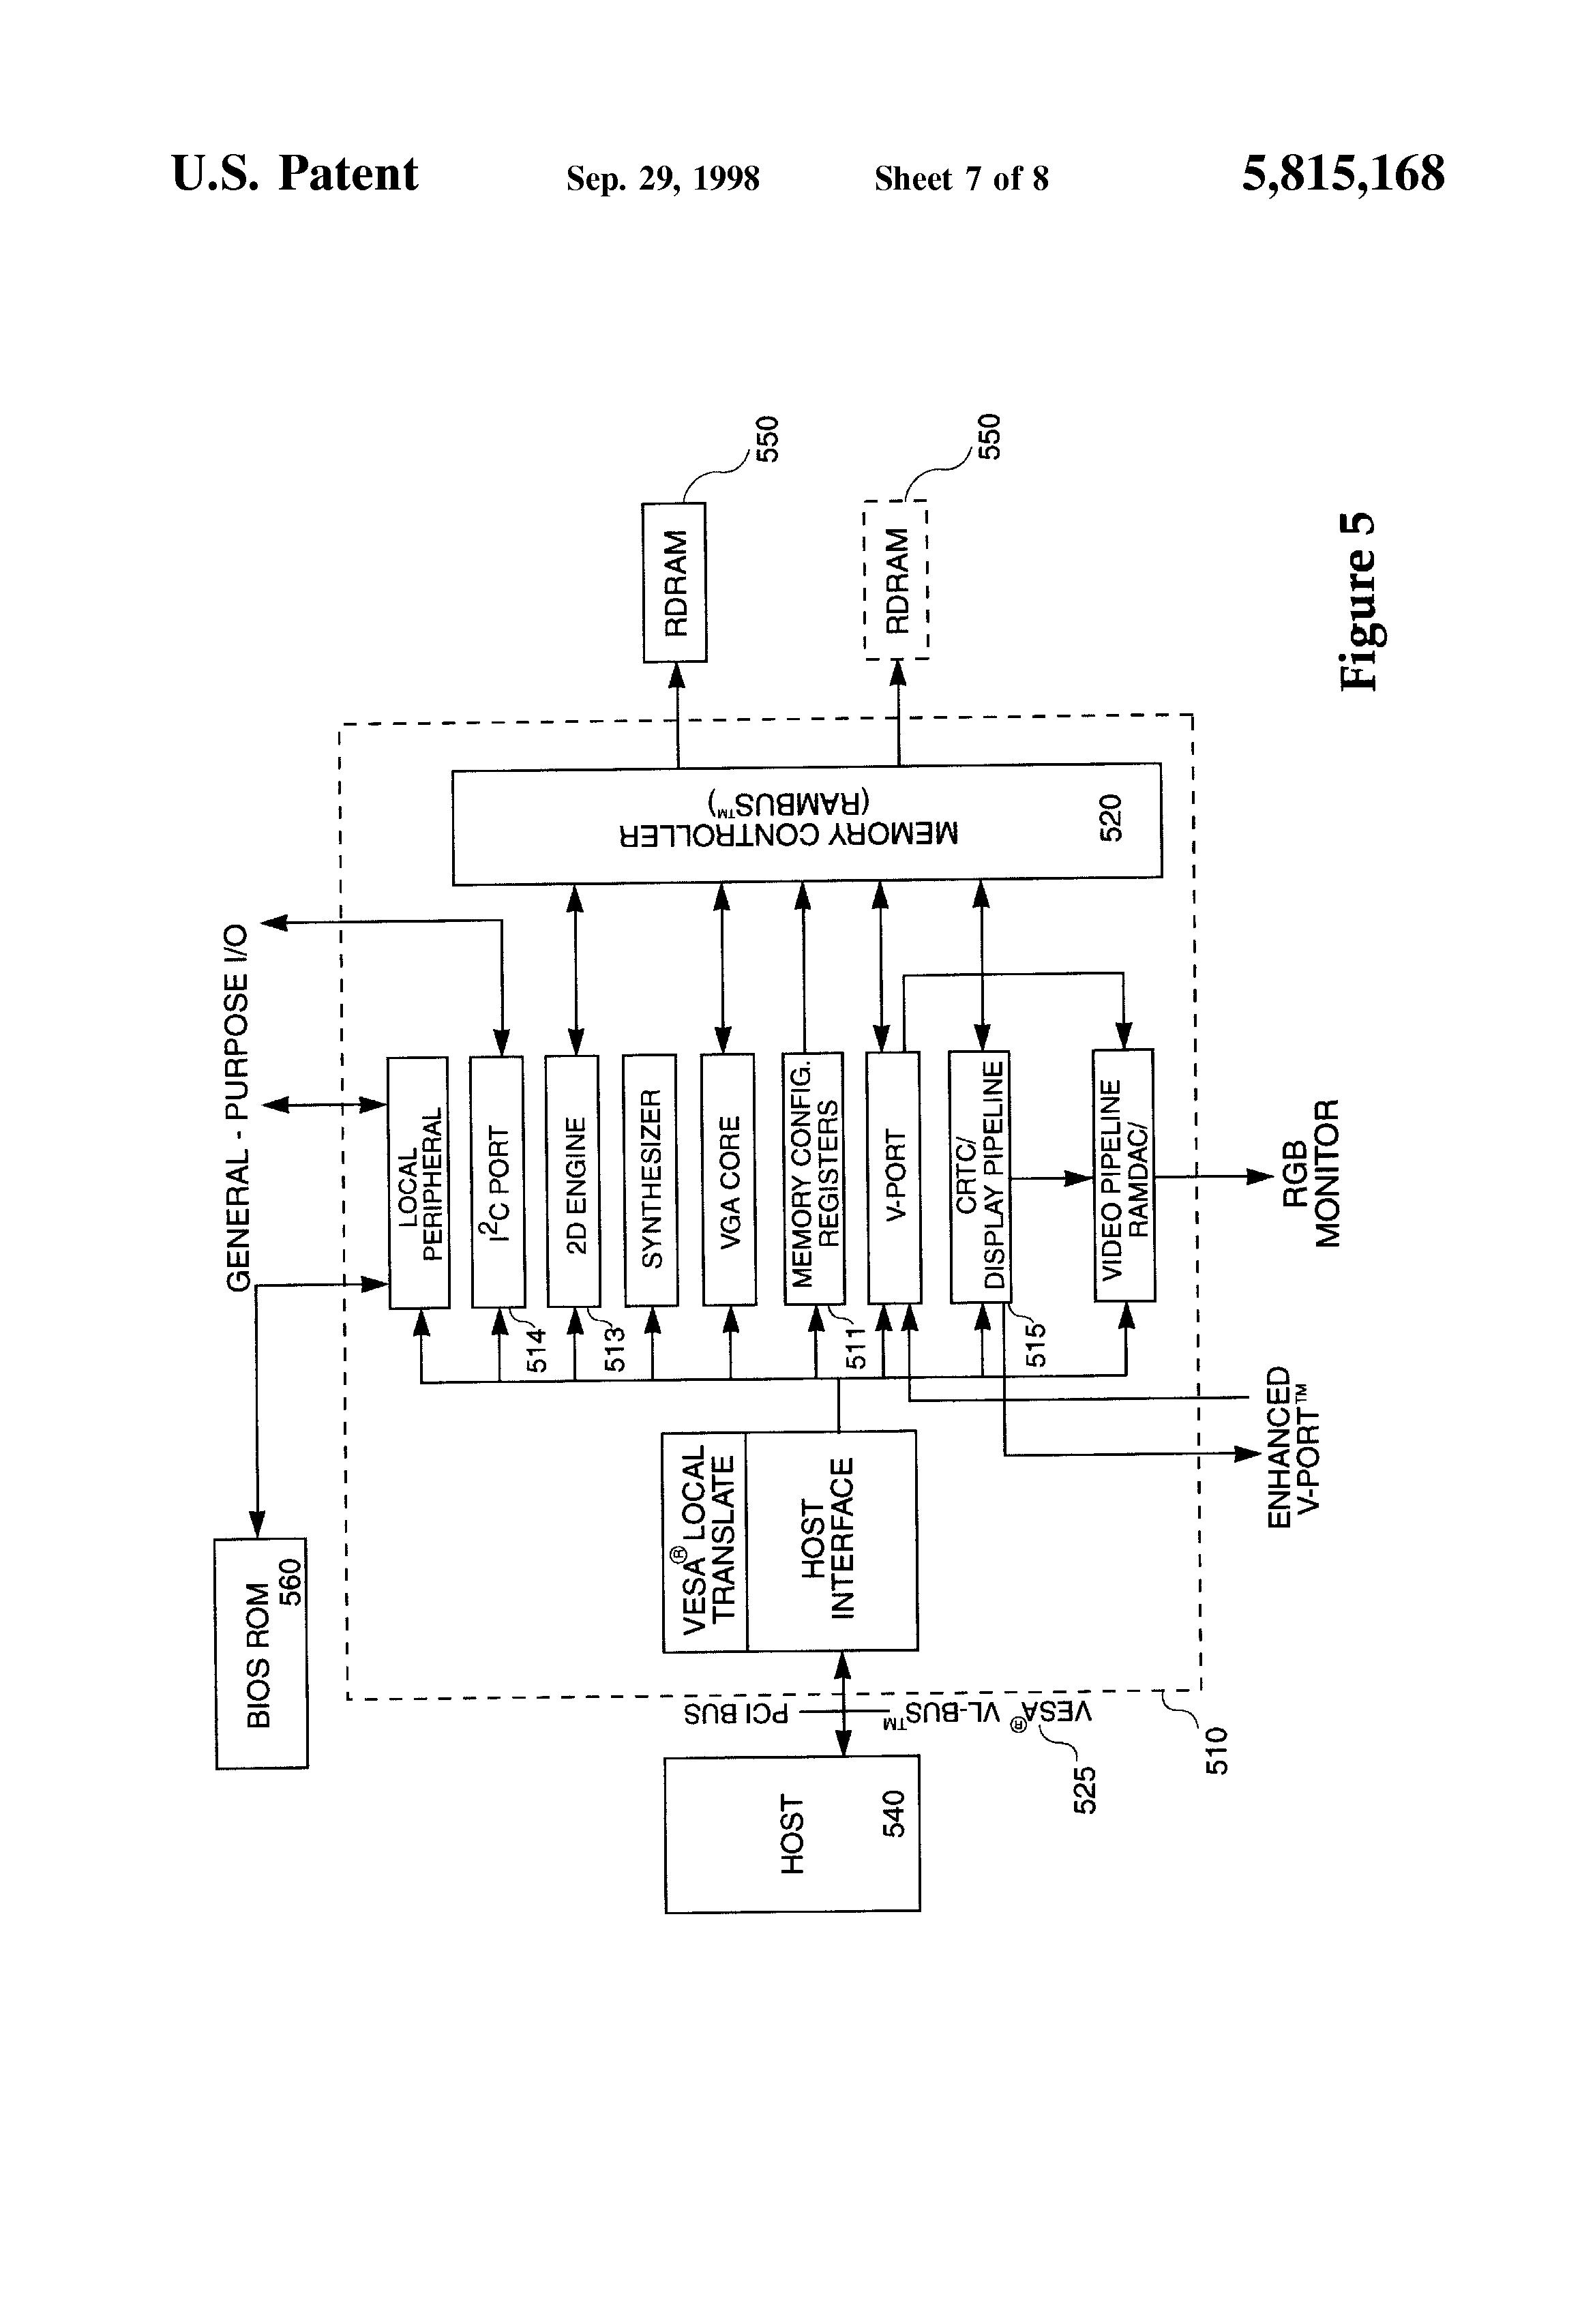 Contemporary sew motor wiring diagram pictures wiring diagram luxury sew motor wiring diagram crest electrical diagram ideas swarovskicordoba Choice Image